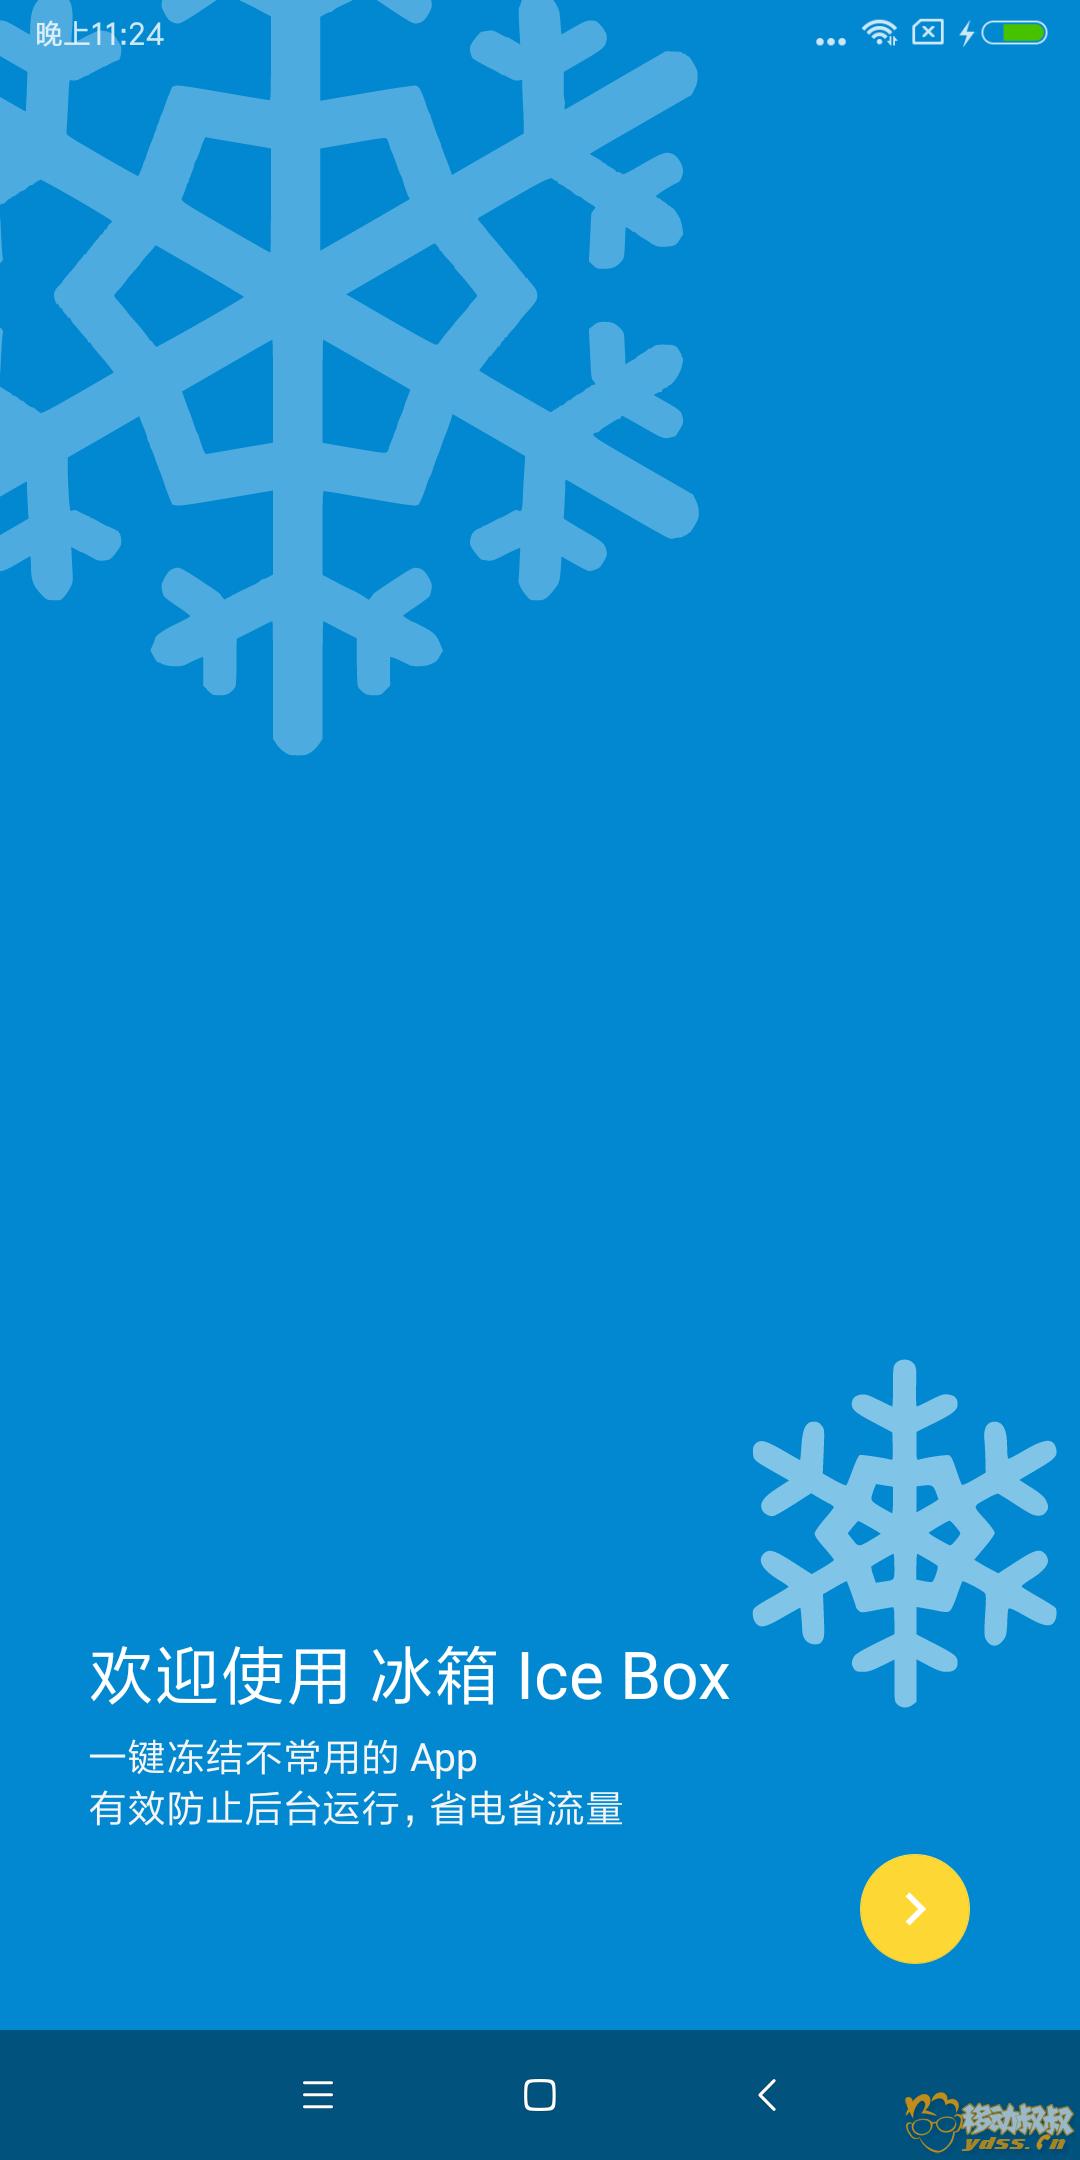 Screenshot_2017-12-30-23-24-44-748_com.catchingnow.icebox.png